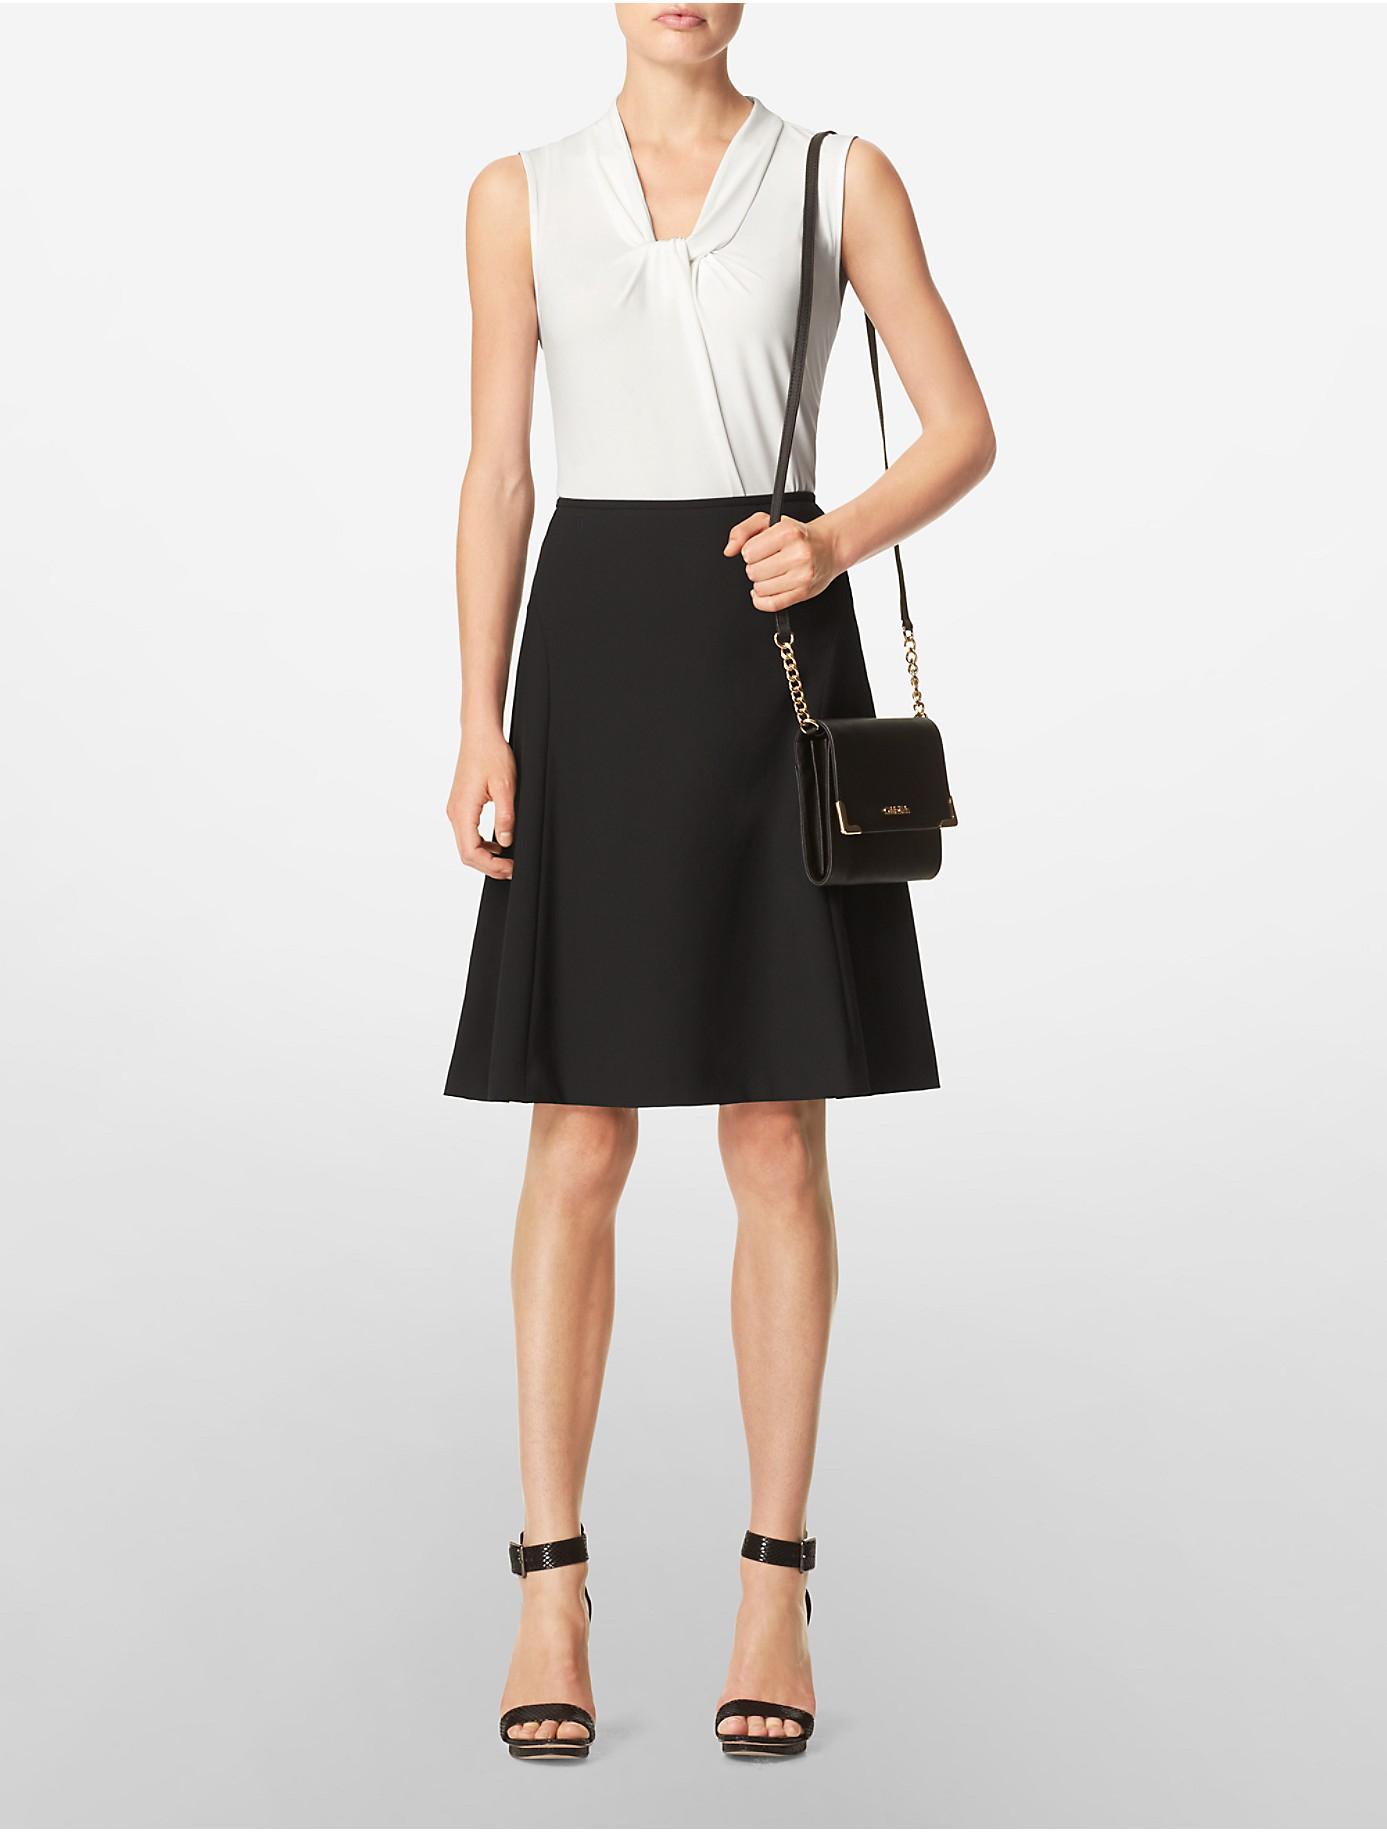 Lyst - Calvin klein Saffiano Leather Crossbody Bag in Black : calvin klein quilted leather crossbody bag - Adamdwight.com